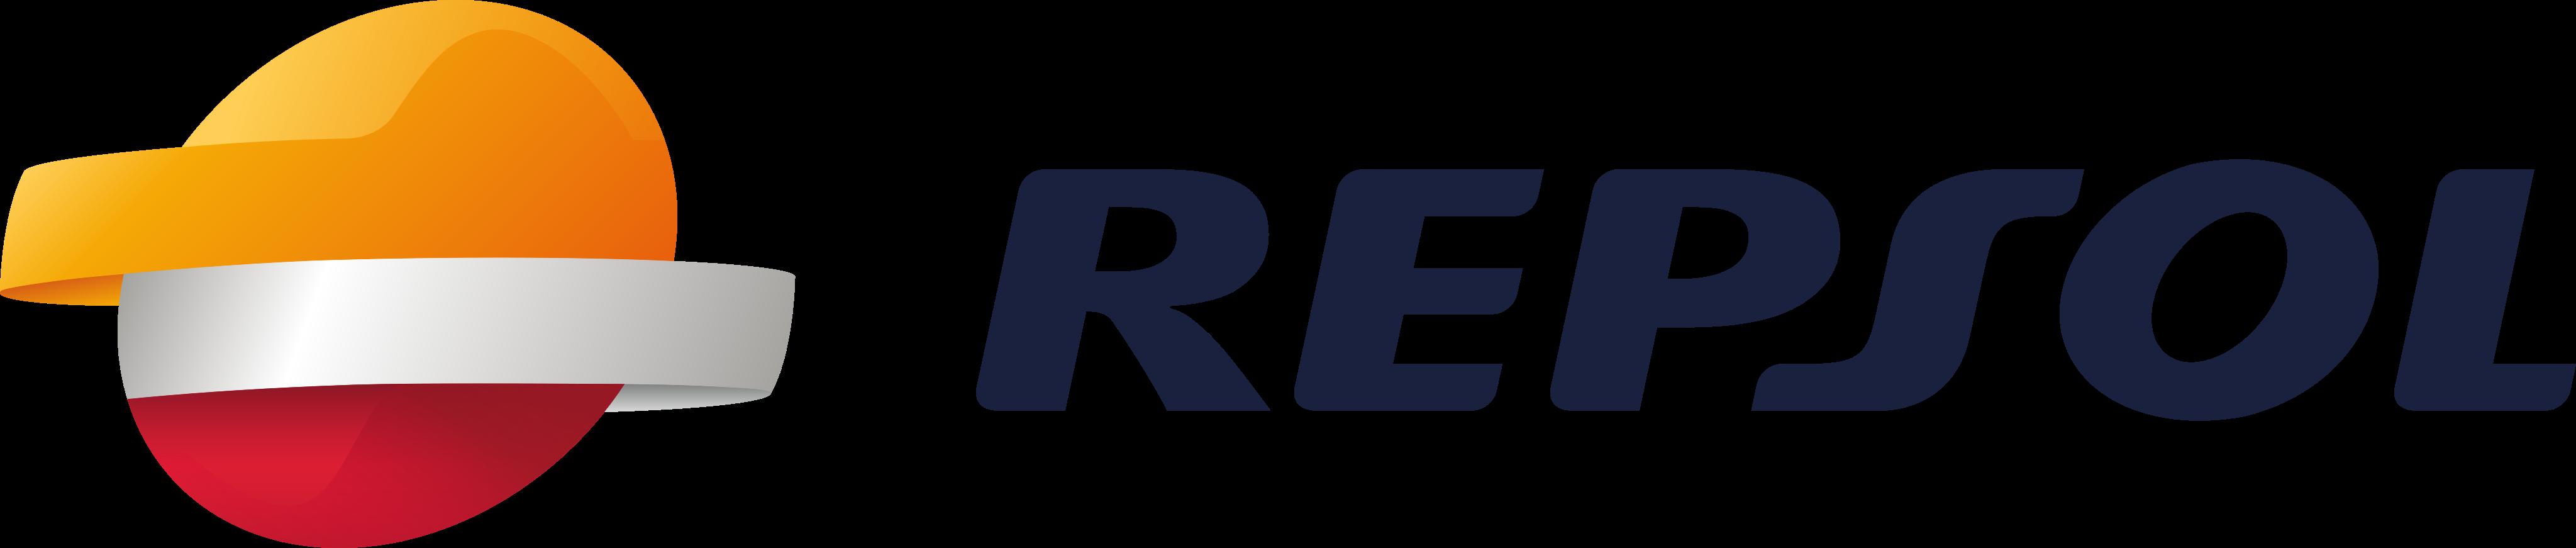 repsol logo - Repsol Logo